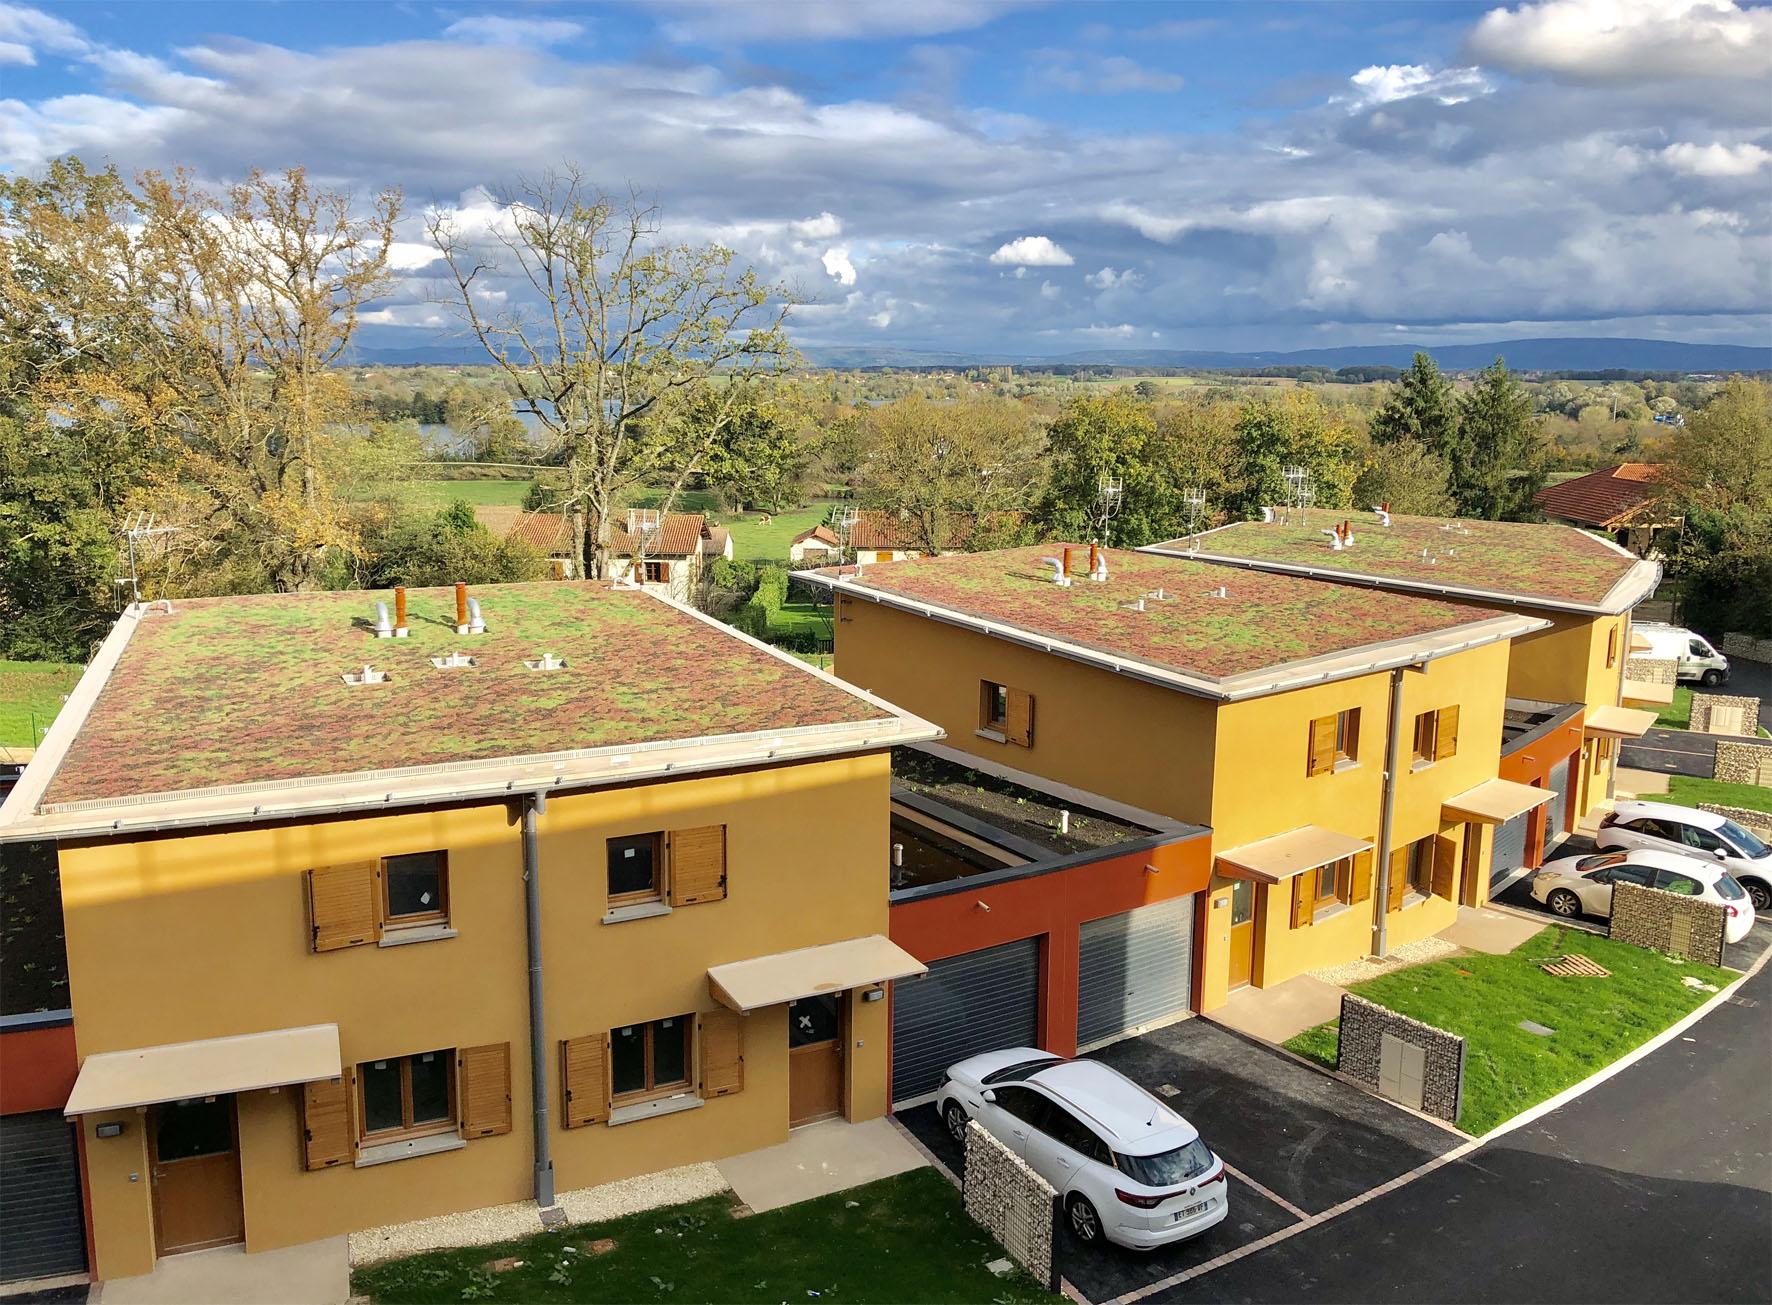 Montrevel en Bresse - Jayat - logements individuels